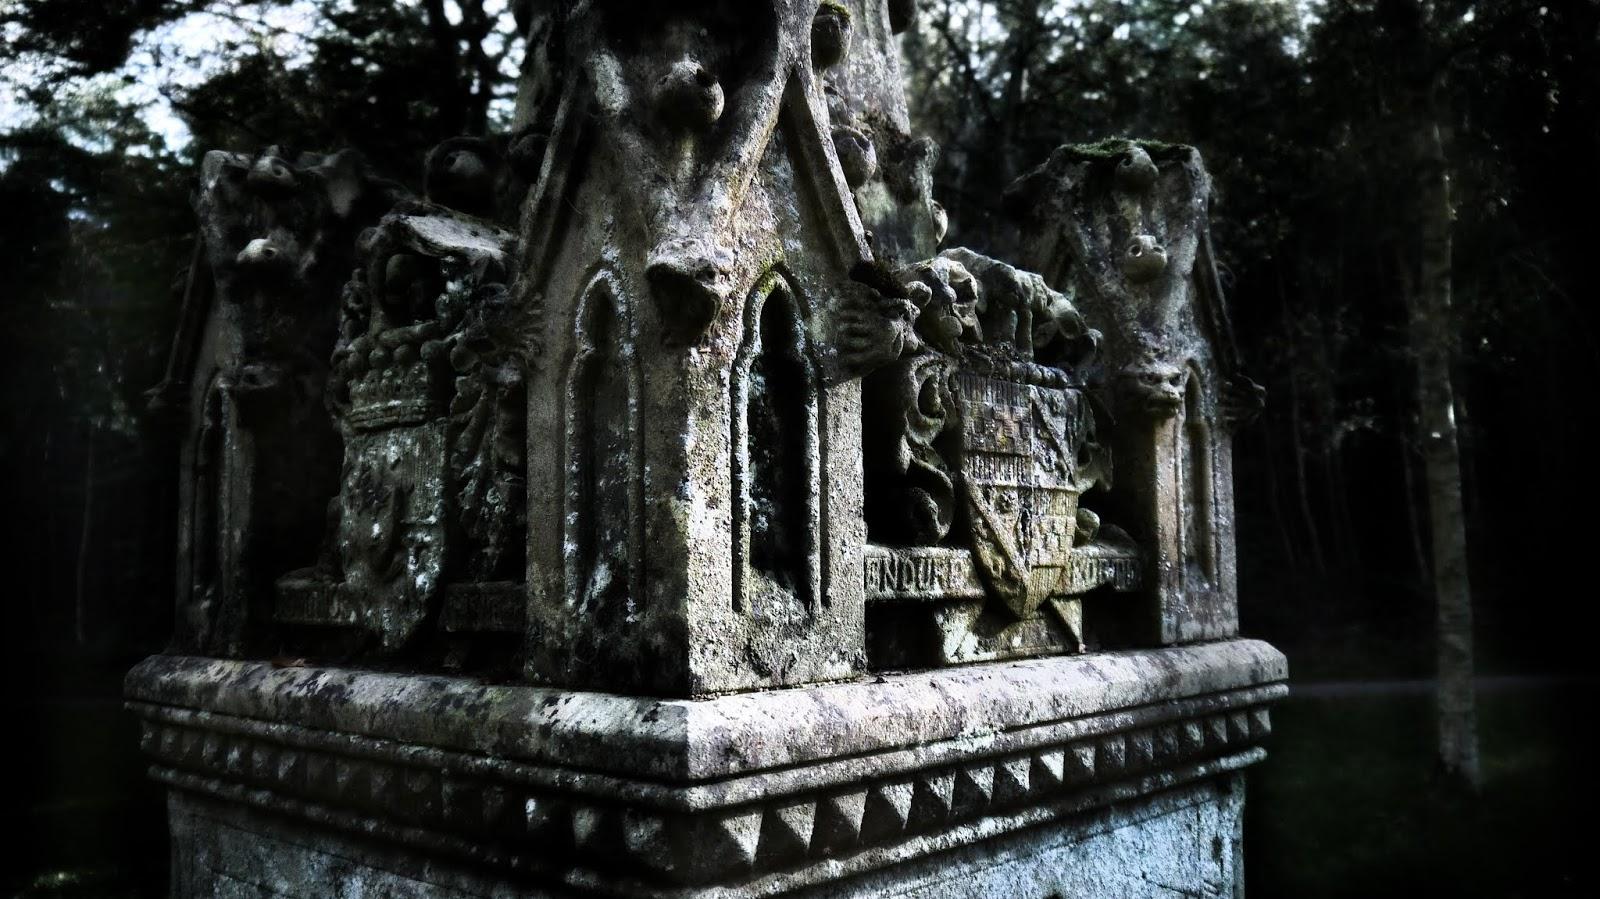 Crawford Priory Sundial